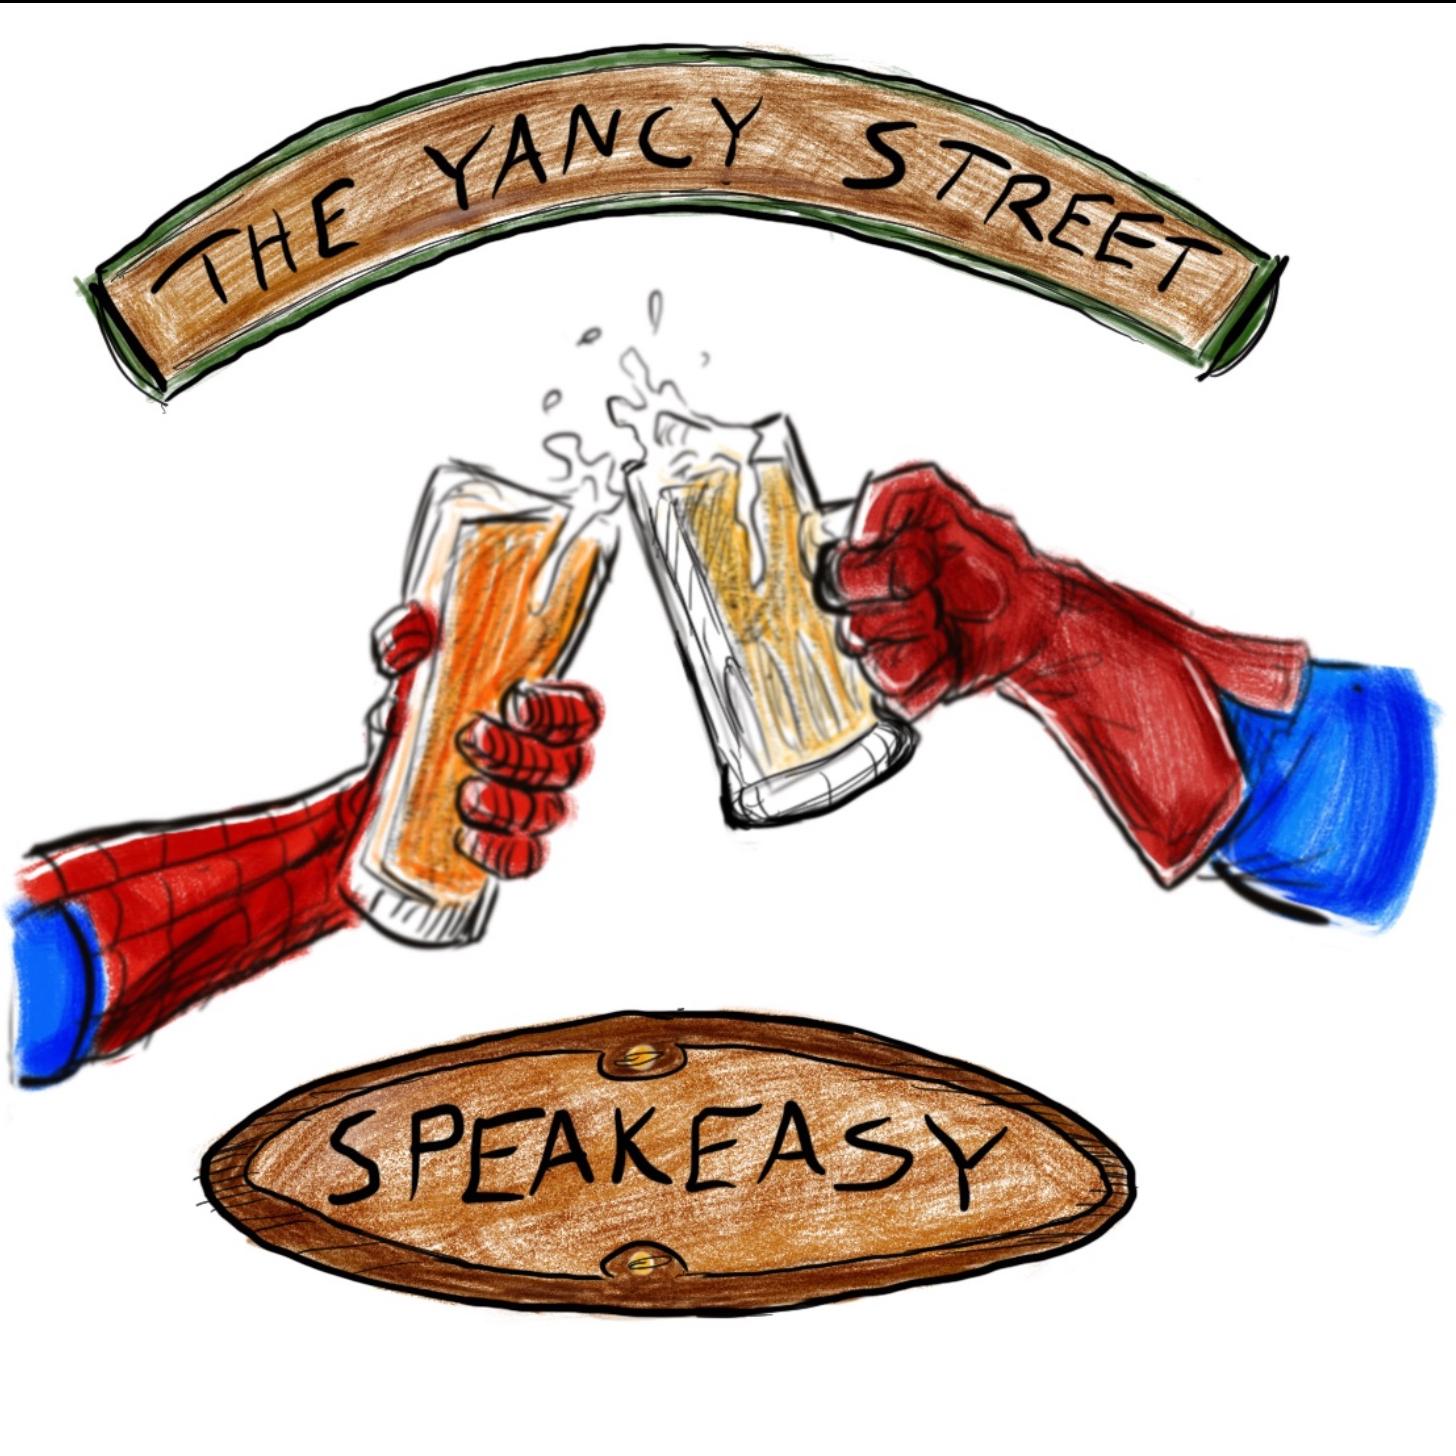 The Yancy St. Speakeasy